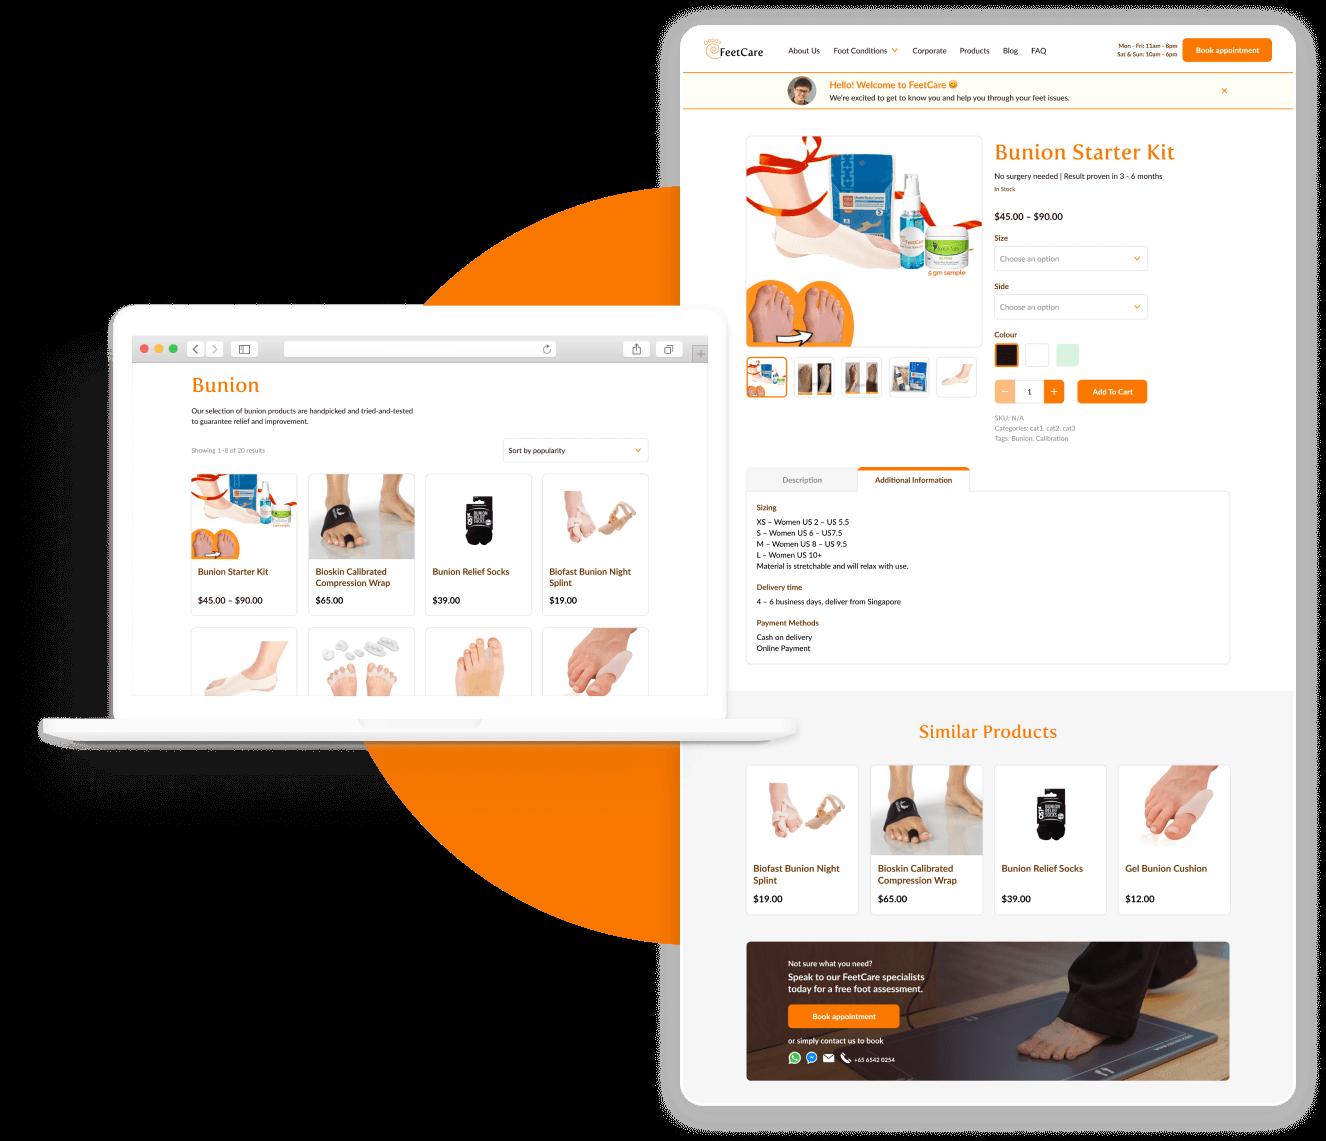 The Visual Team client website thumbnail - feetcare